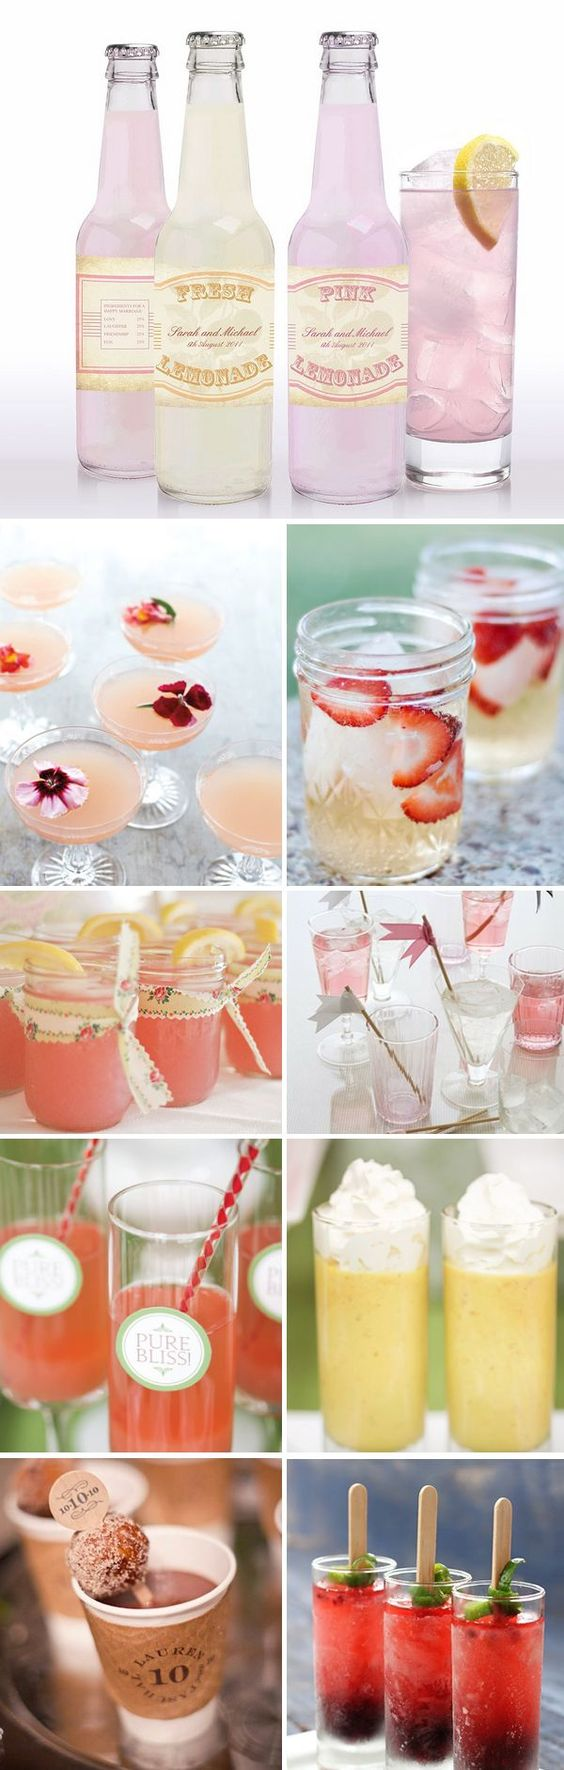 Drinks reception food and wedding reception food on pinterest for Diy wedding ideas for summer